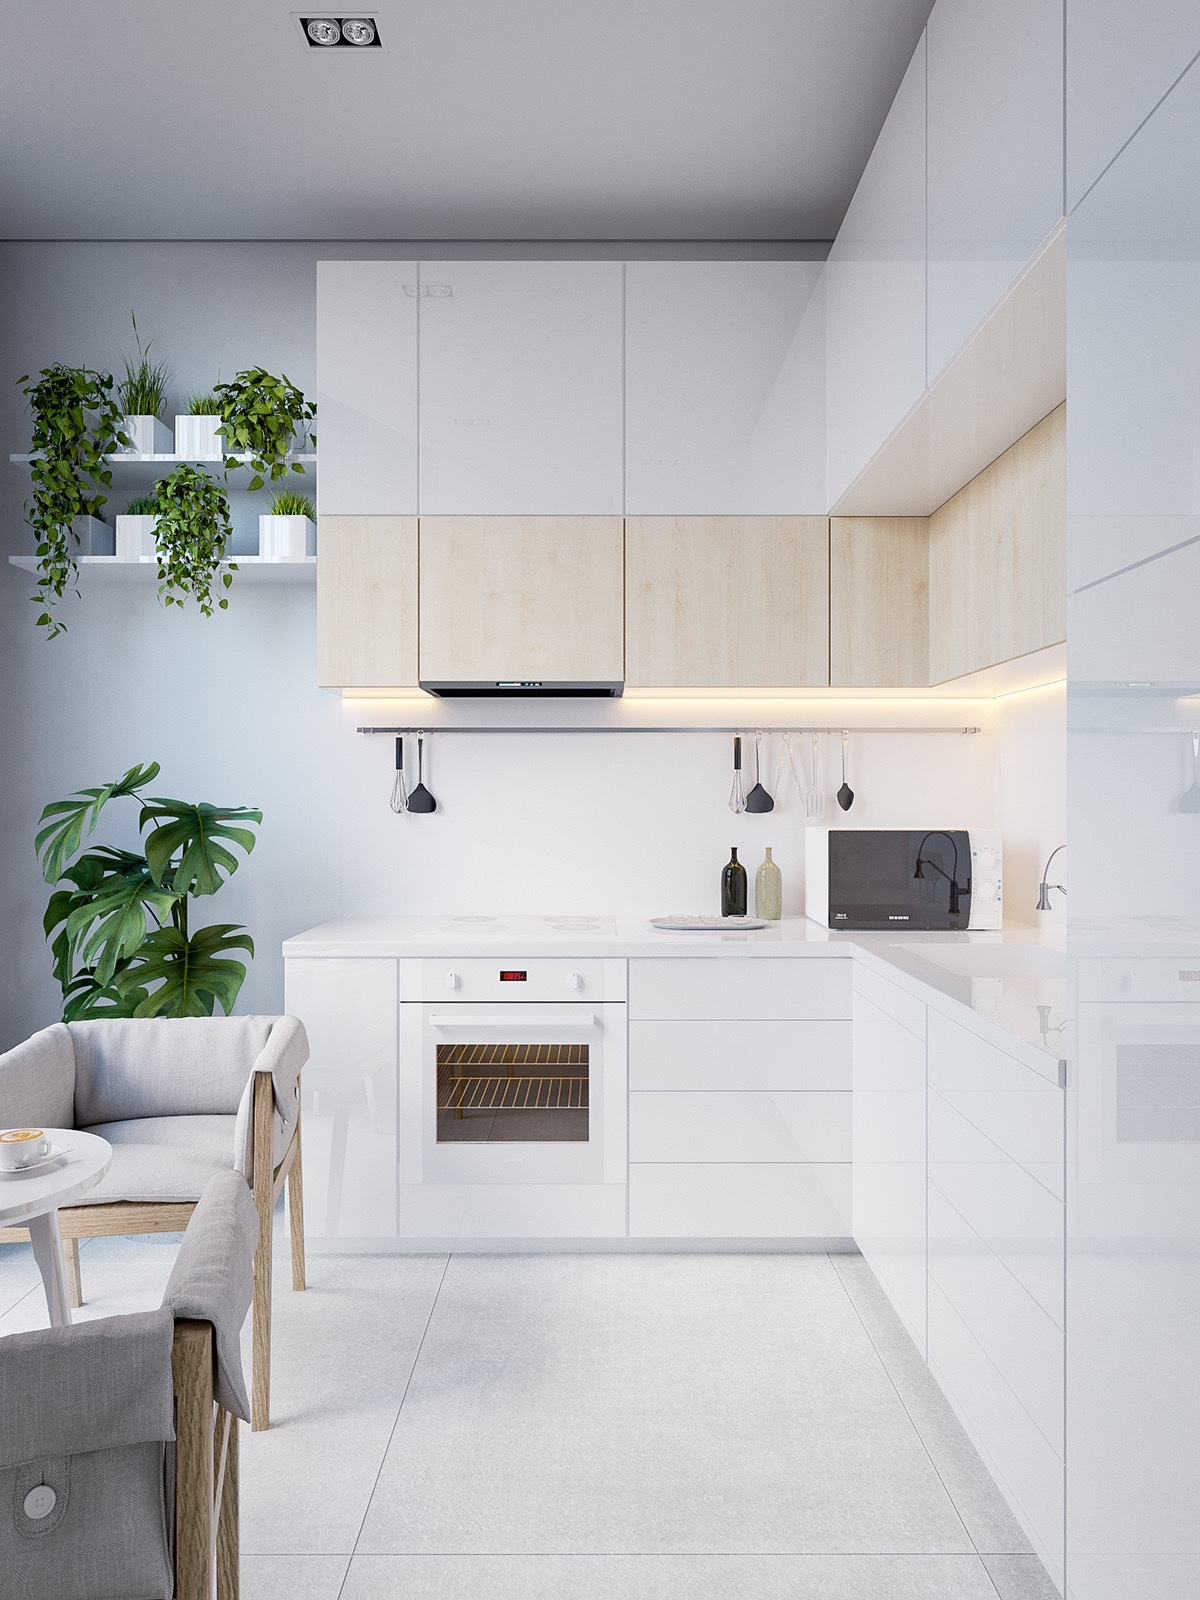 Desain Interior Dapur Skandinavia Serba Putih – source: pinterest.com